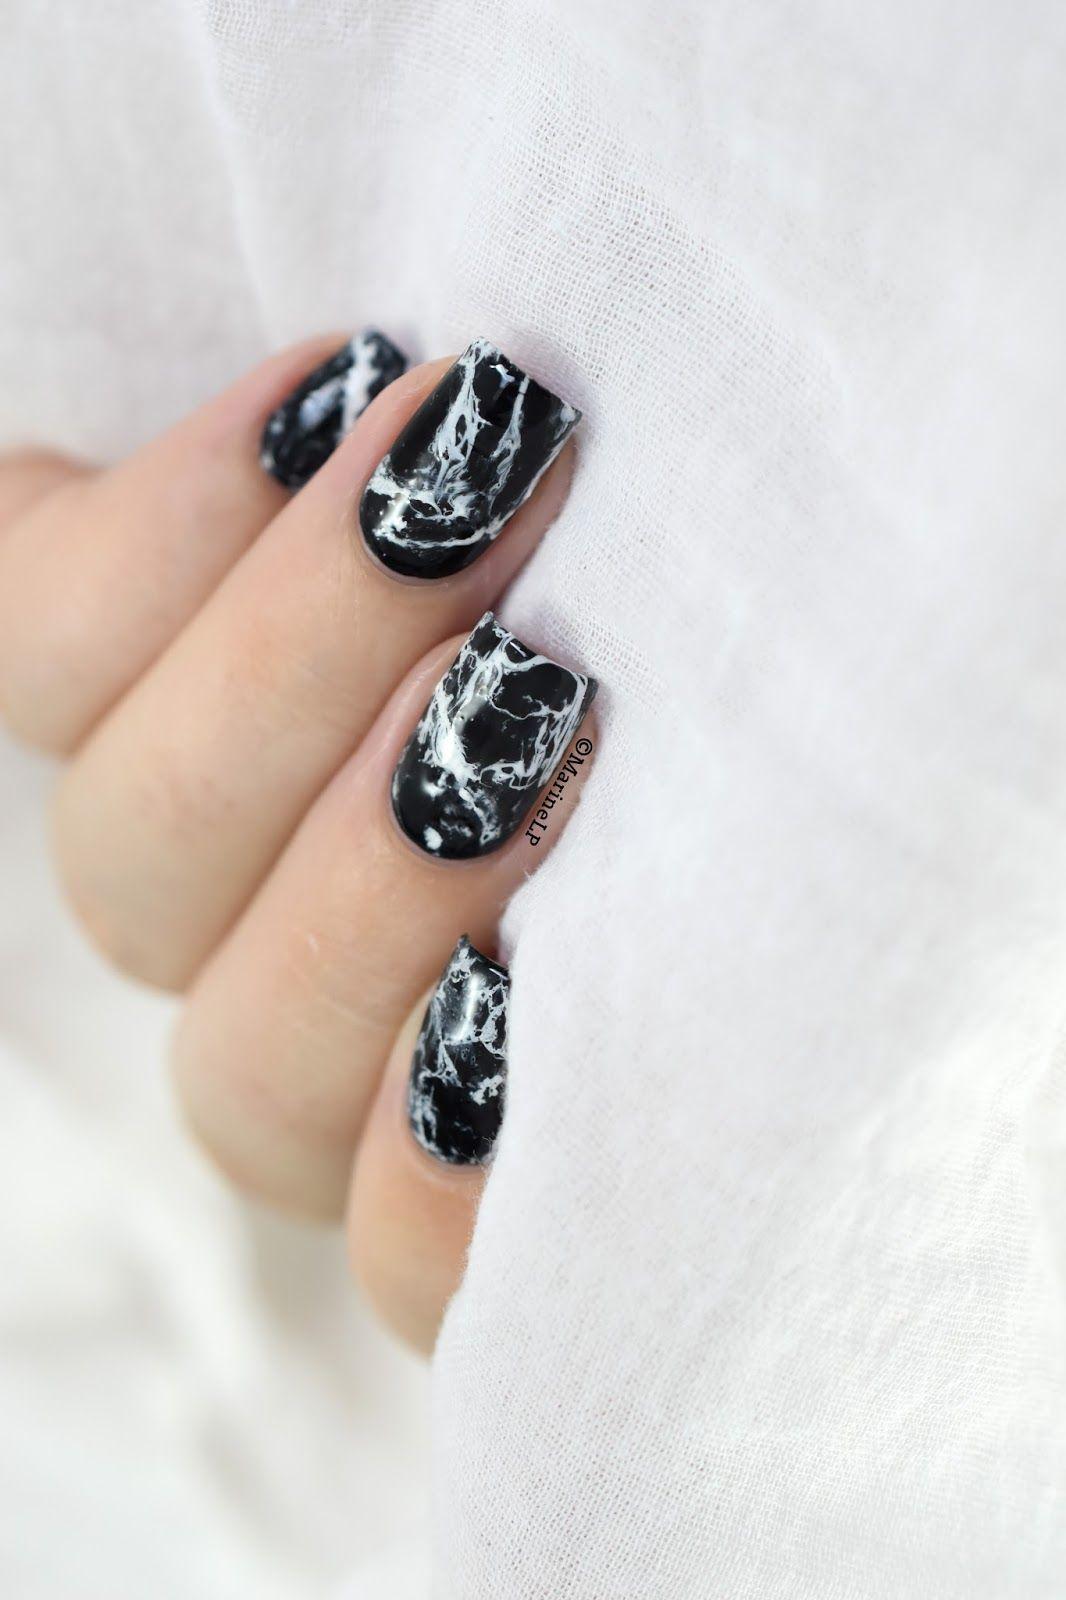 Black Marble Nails Video Tuto Vernis A Ongles Jolis Ongles